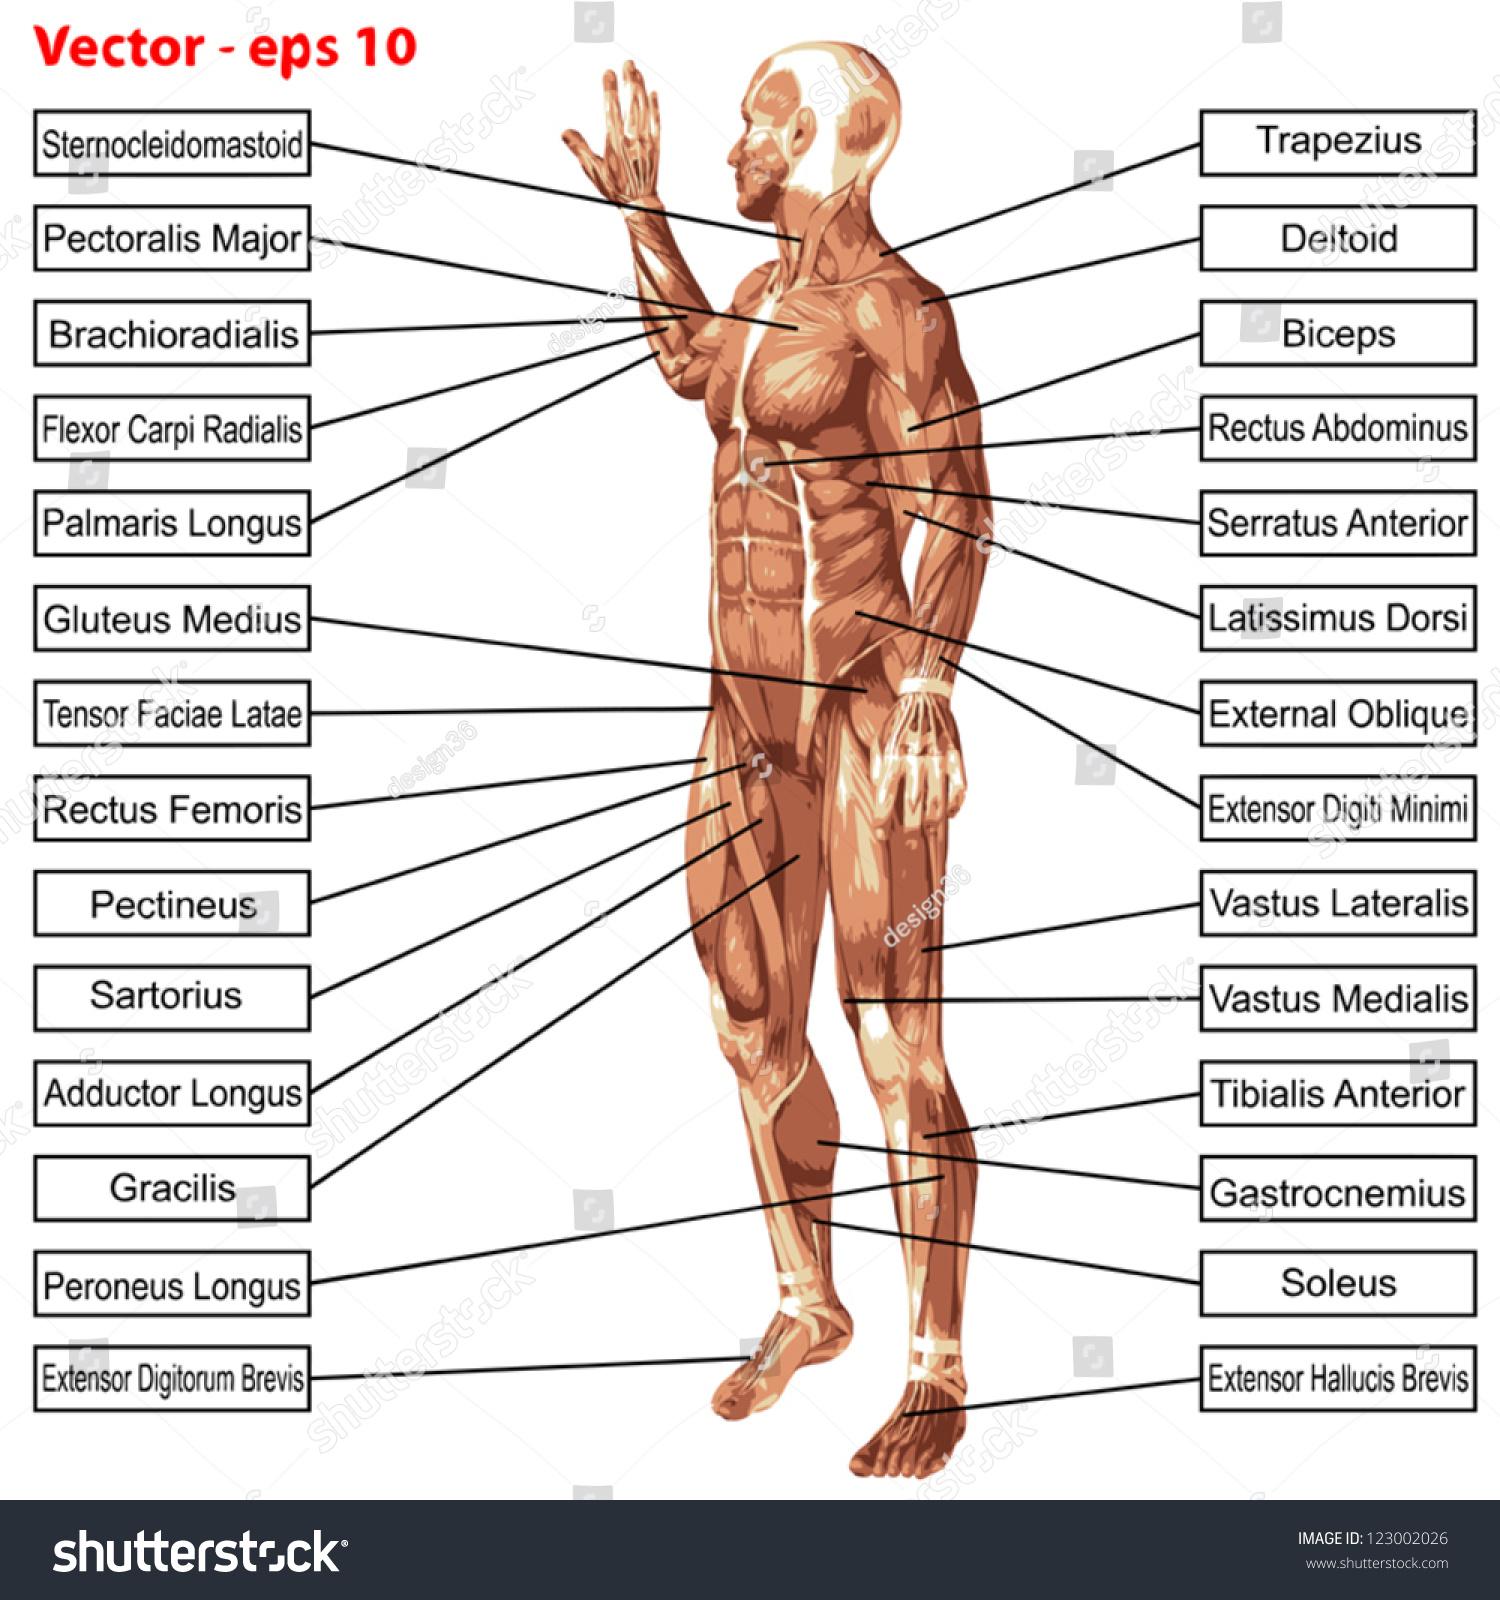 Groß Anatomie Lumbalpunktion Bilder - Anatomie Ideen - finotti.info